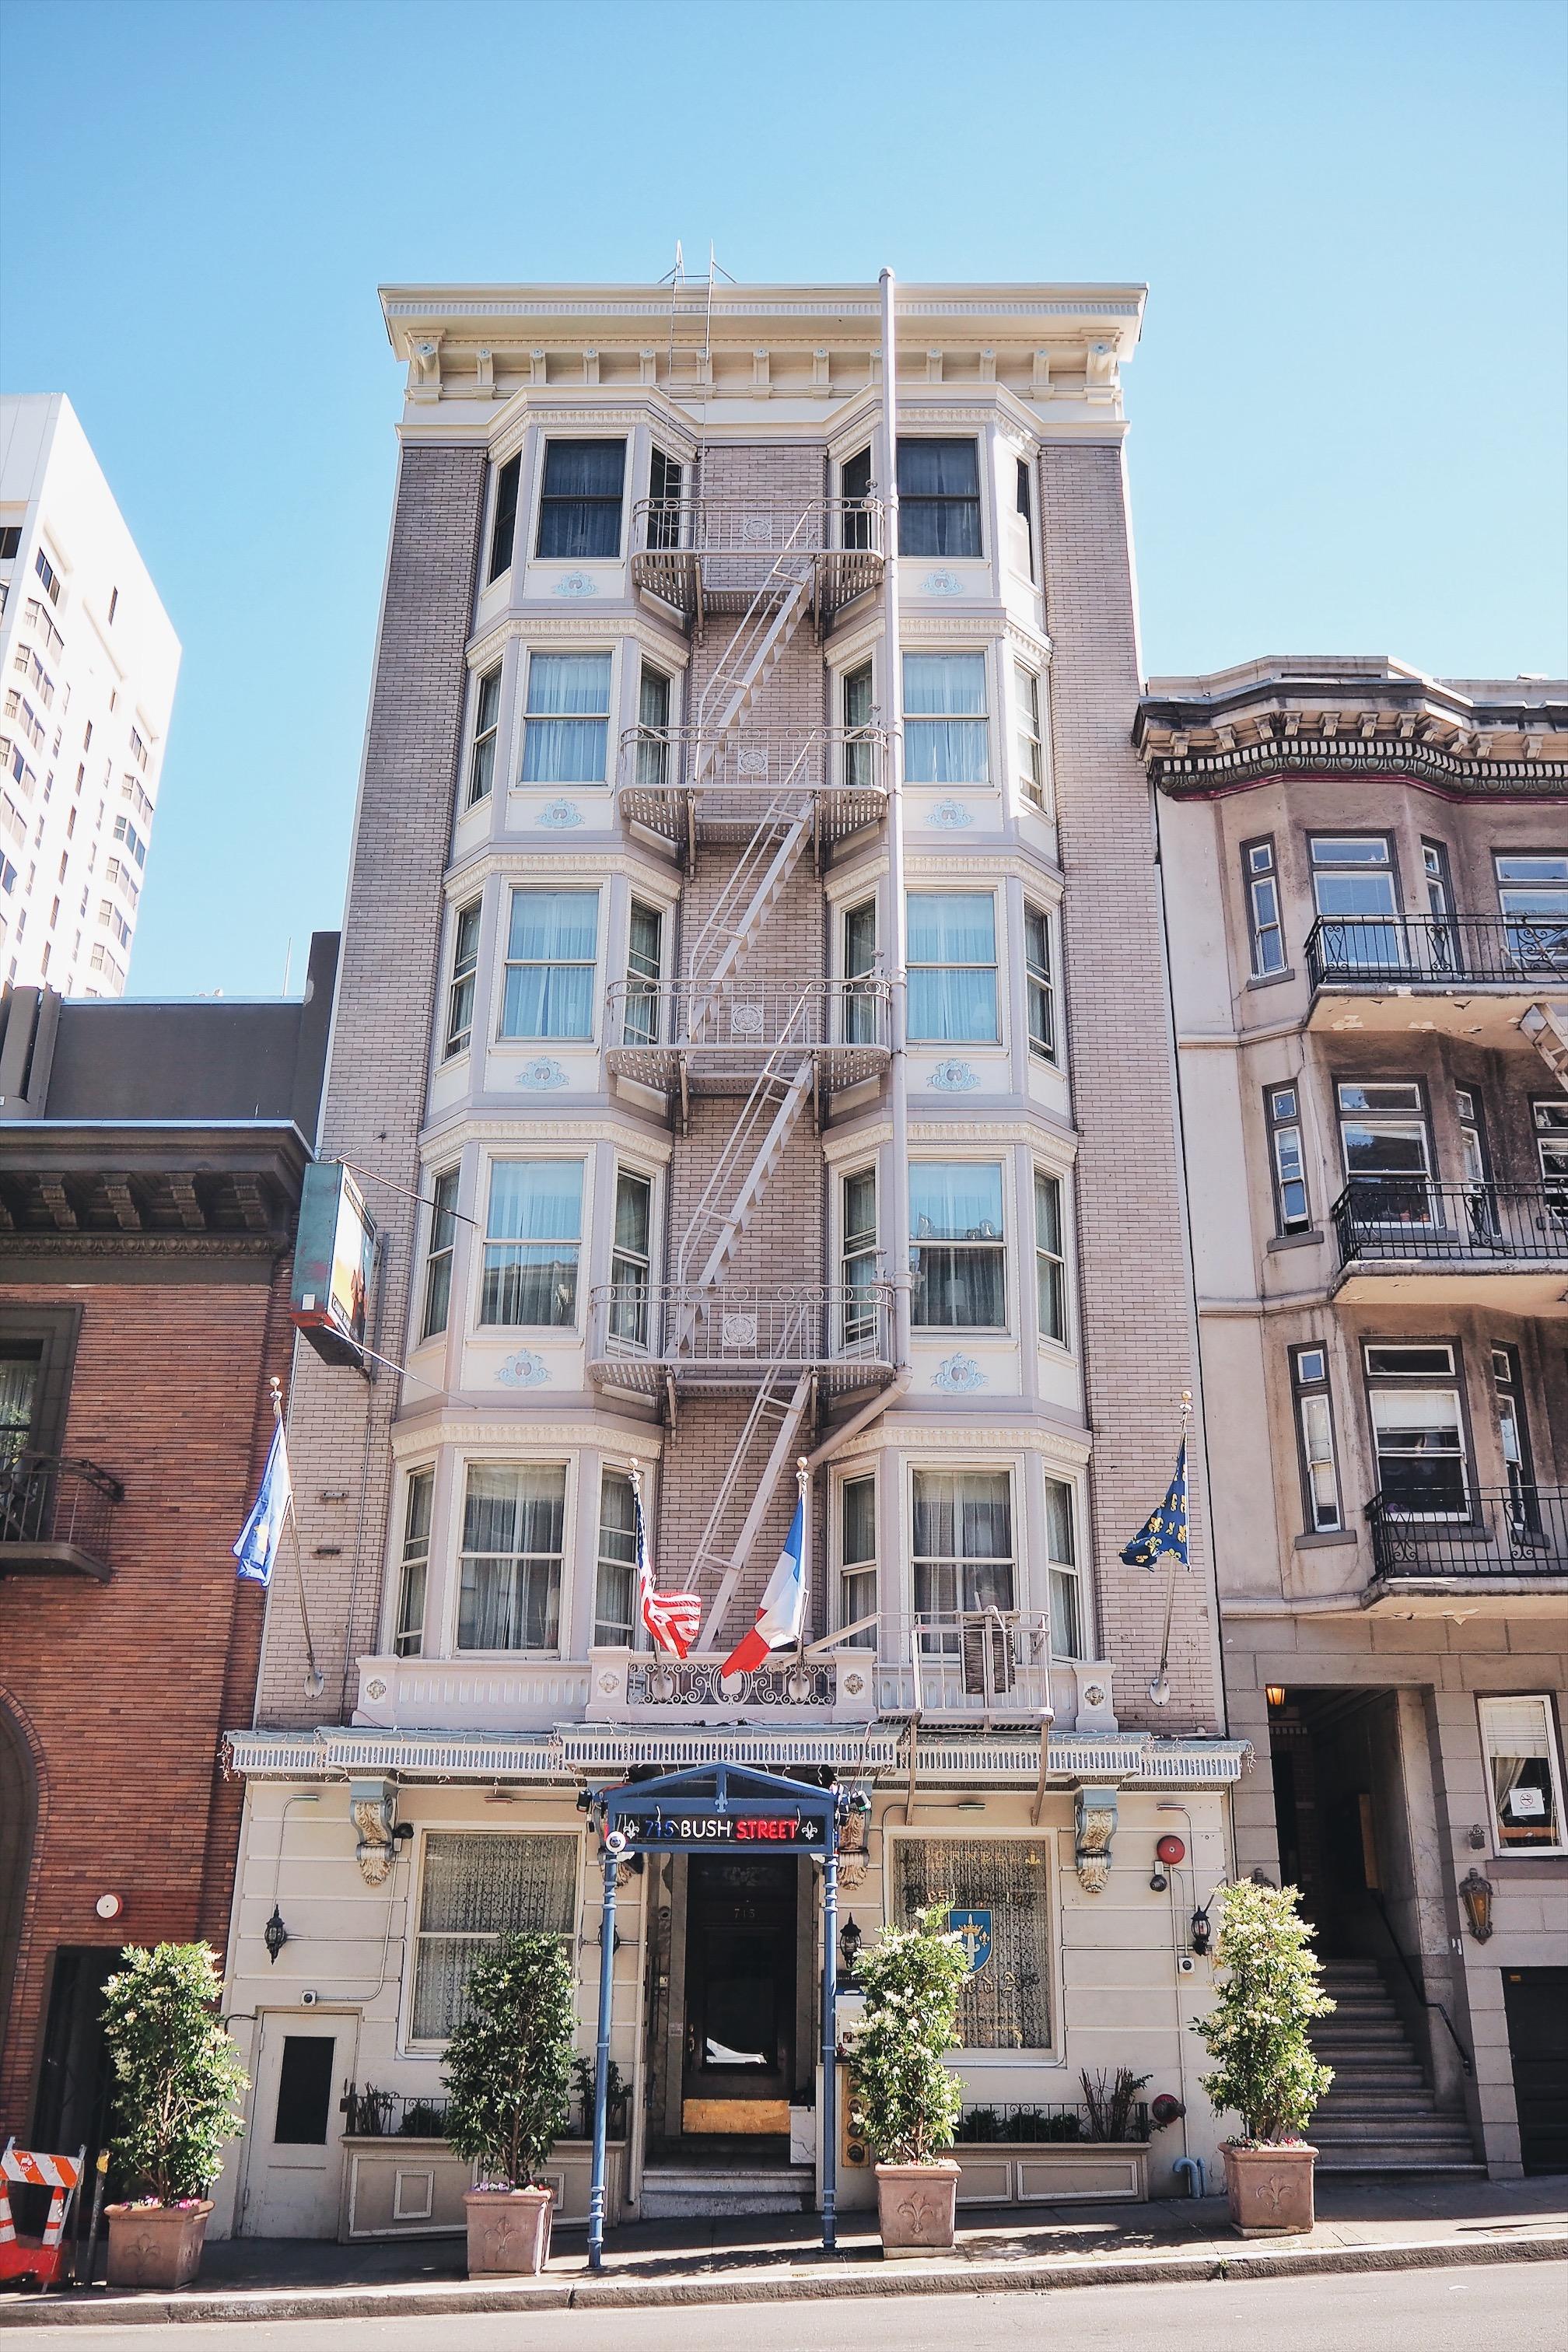 San Francisco Cornell Hotel de France